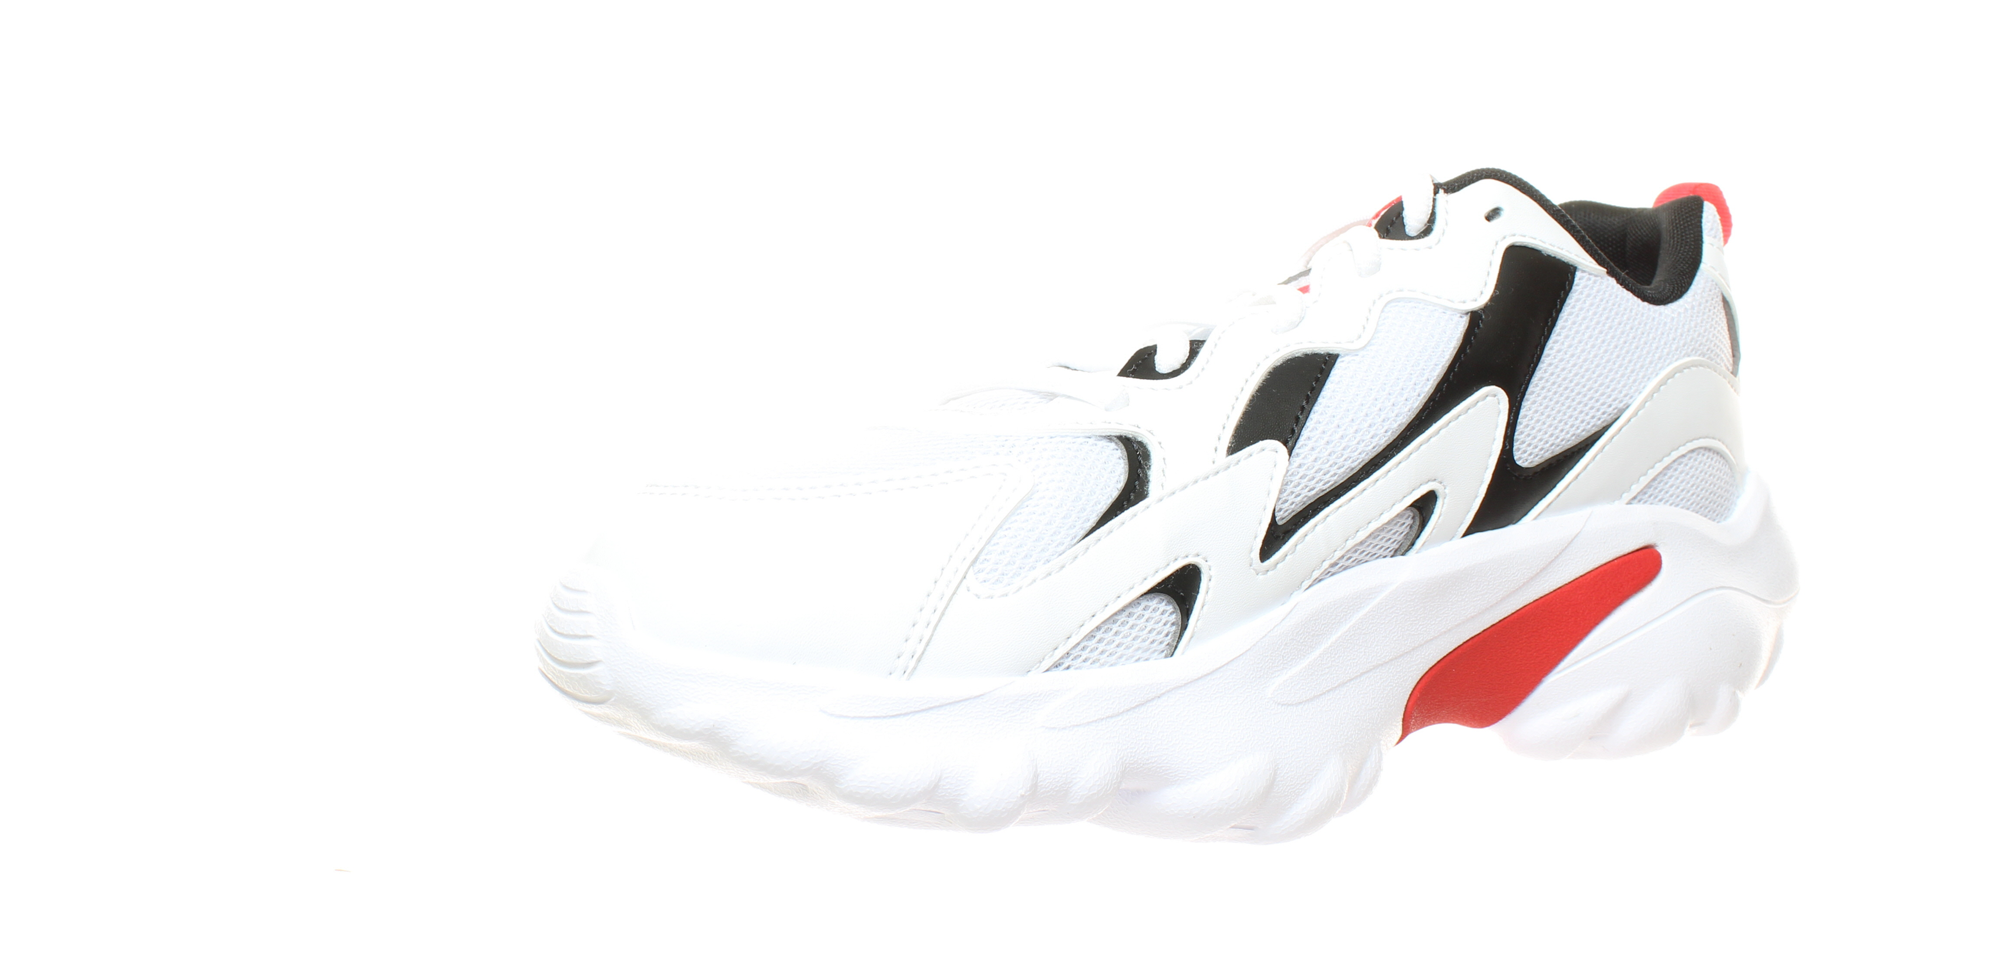 Reebok Mens Dmx Series 1000 White Running Shoes Size 10.5